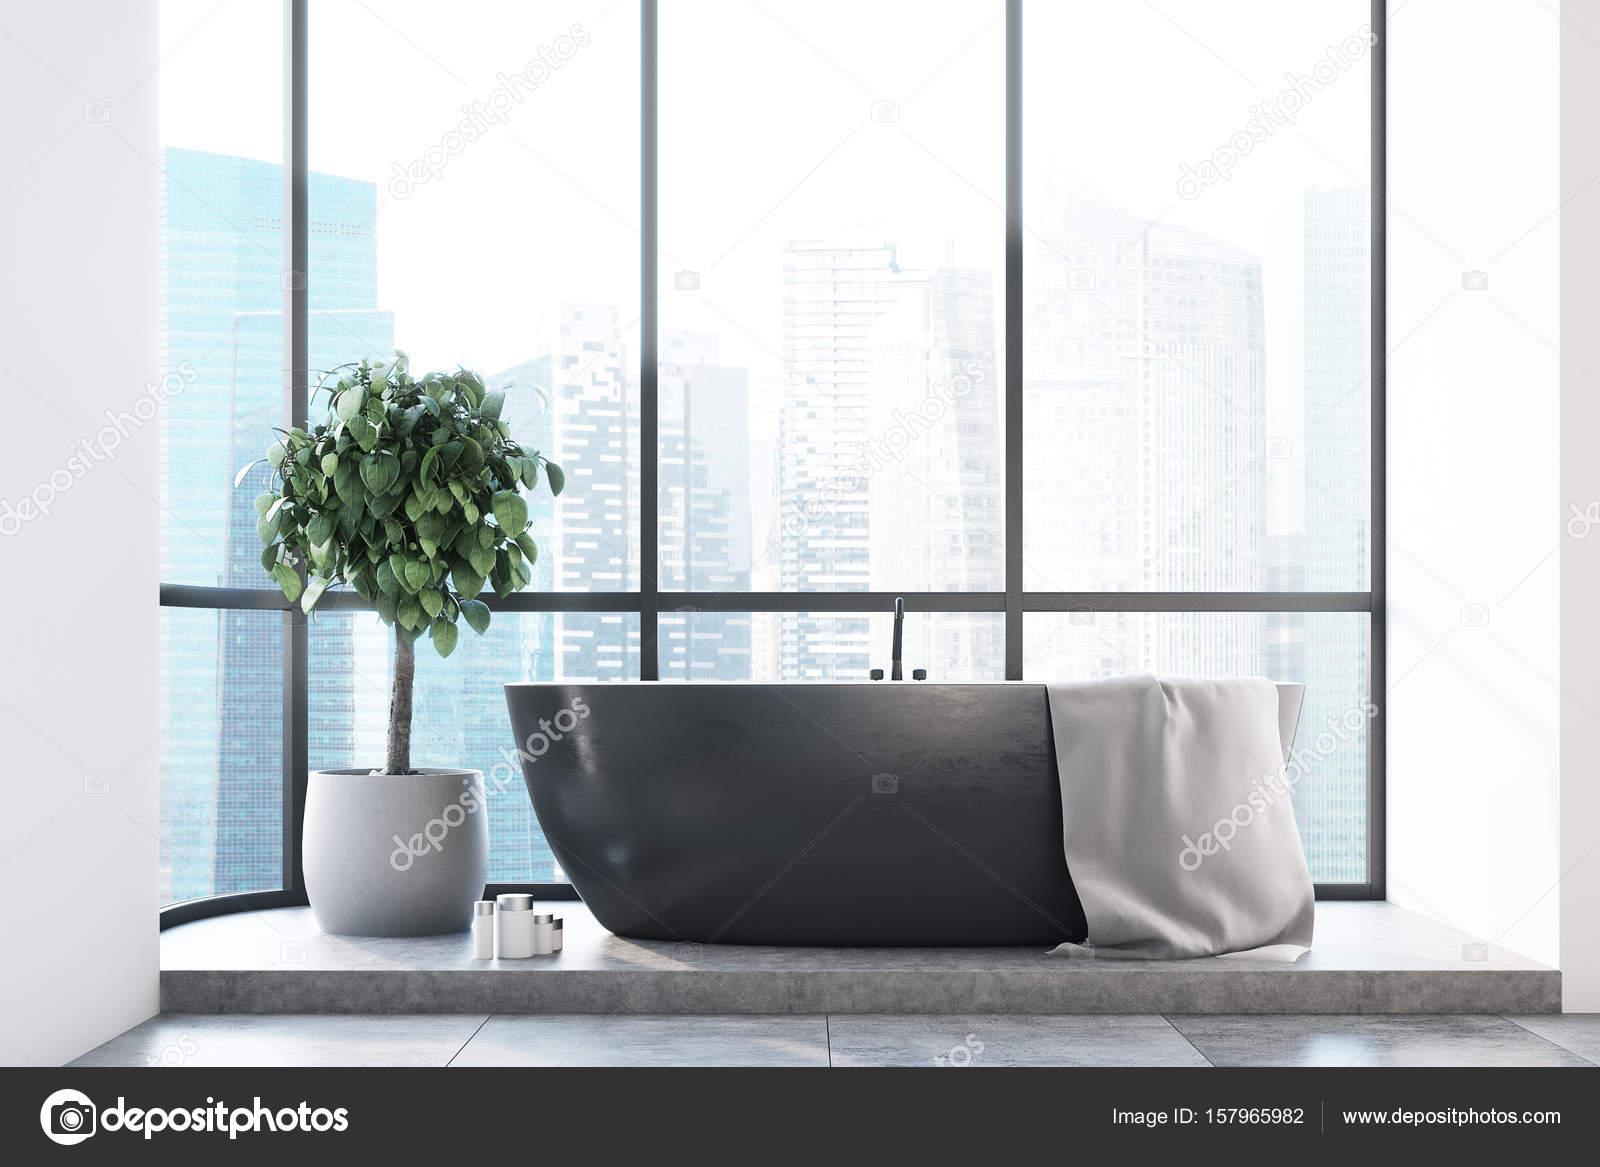 Vasca Da Bagno Nera : Vasca da bagno panoramico nero u2014 foto stock © denisismagilov #157965982